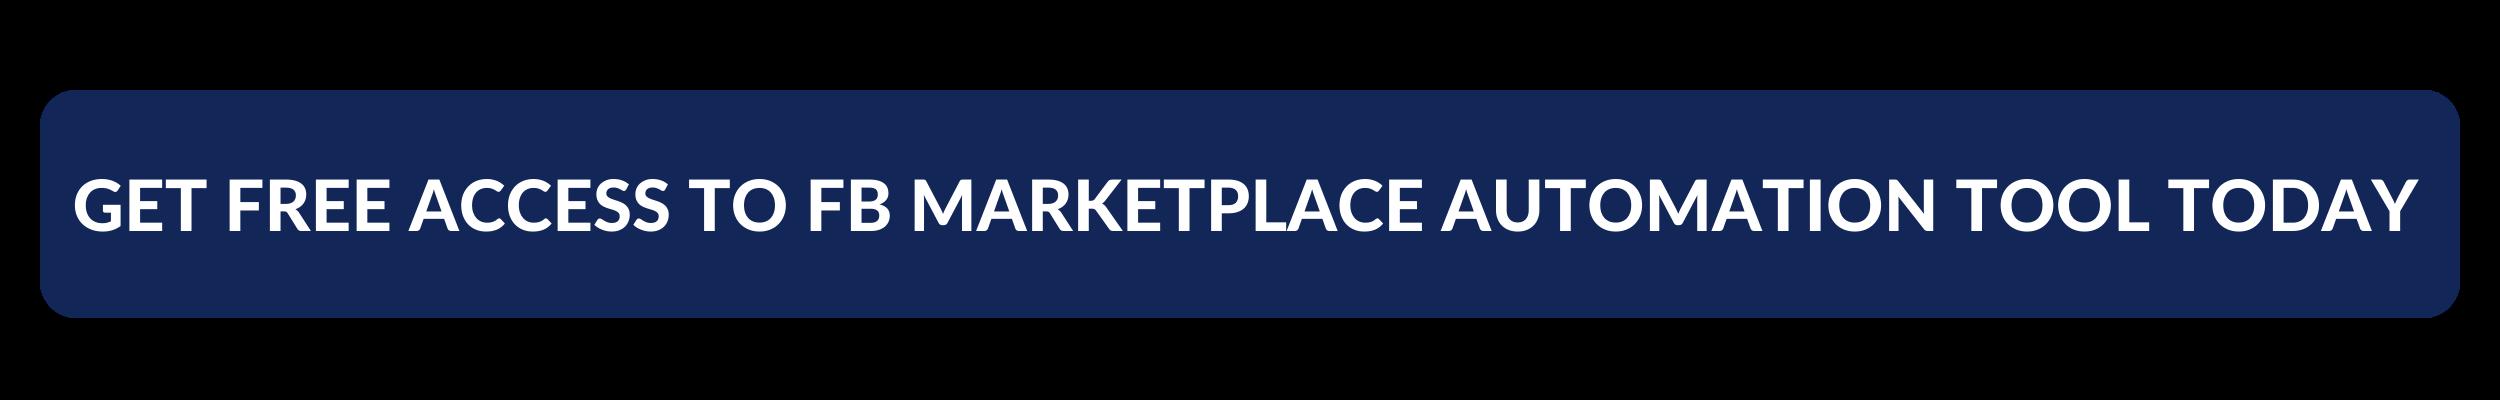 FB Marketplace automation tool